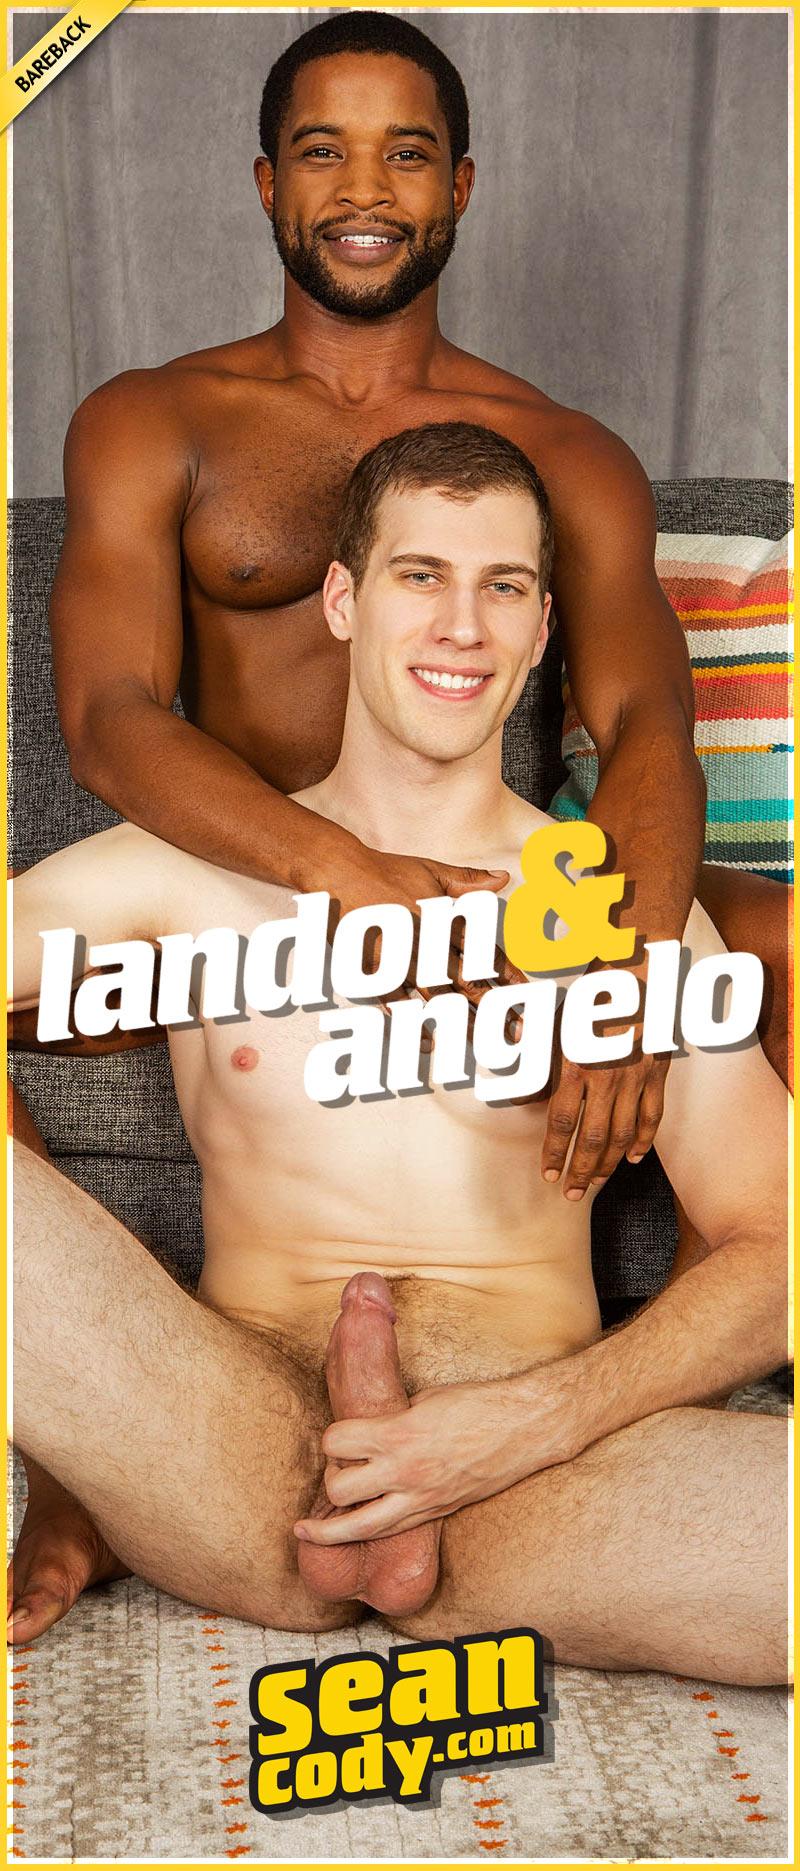 Landon Fucks Angelo (Bareback) at SeanCody